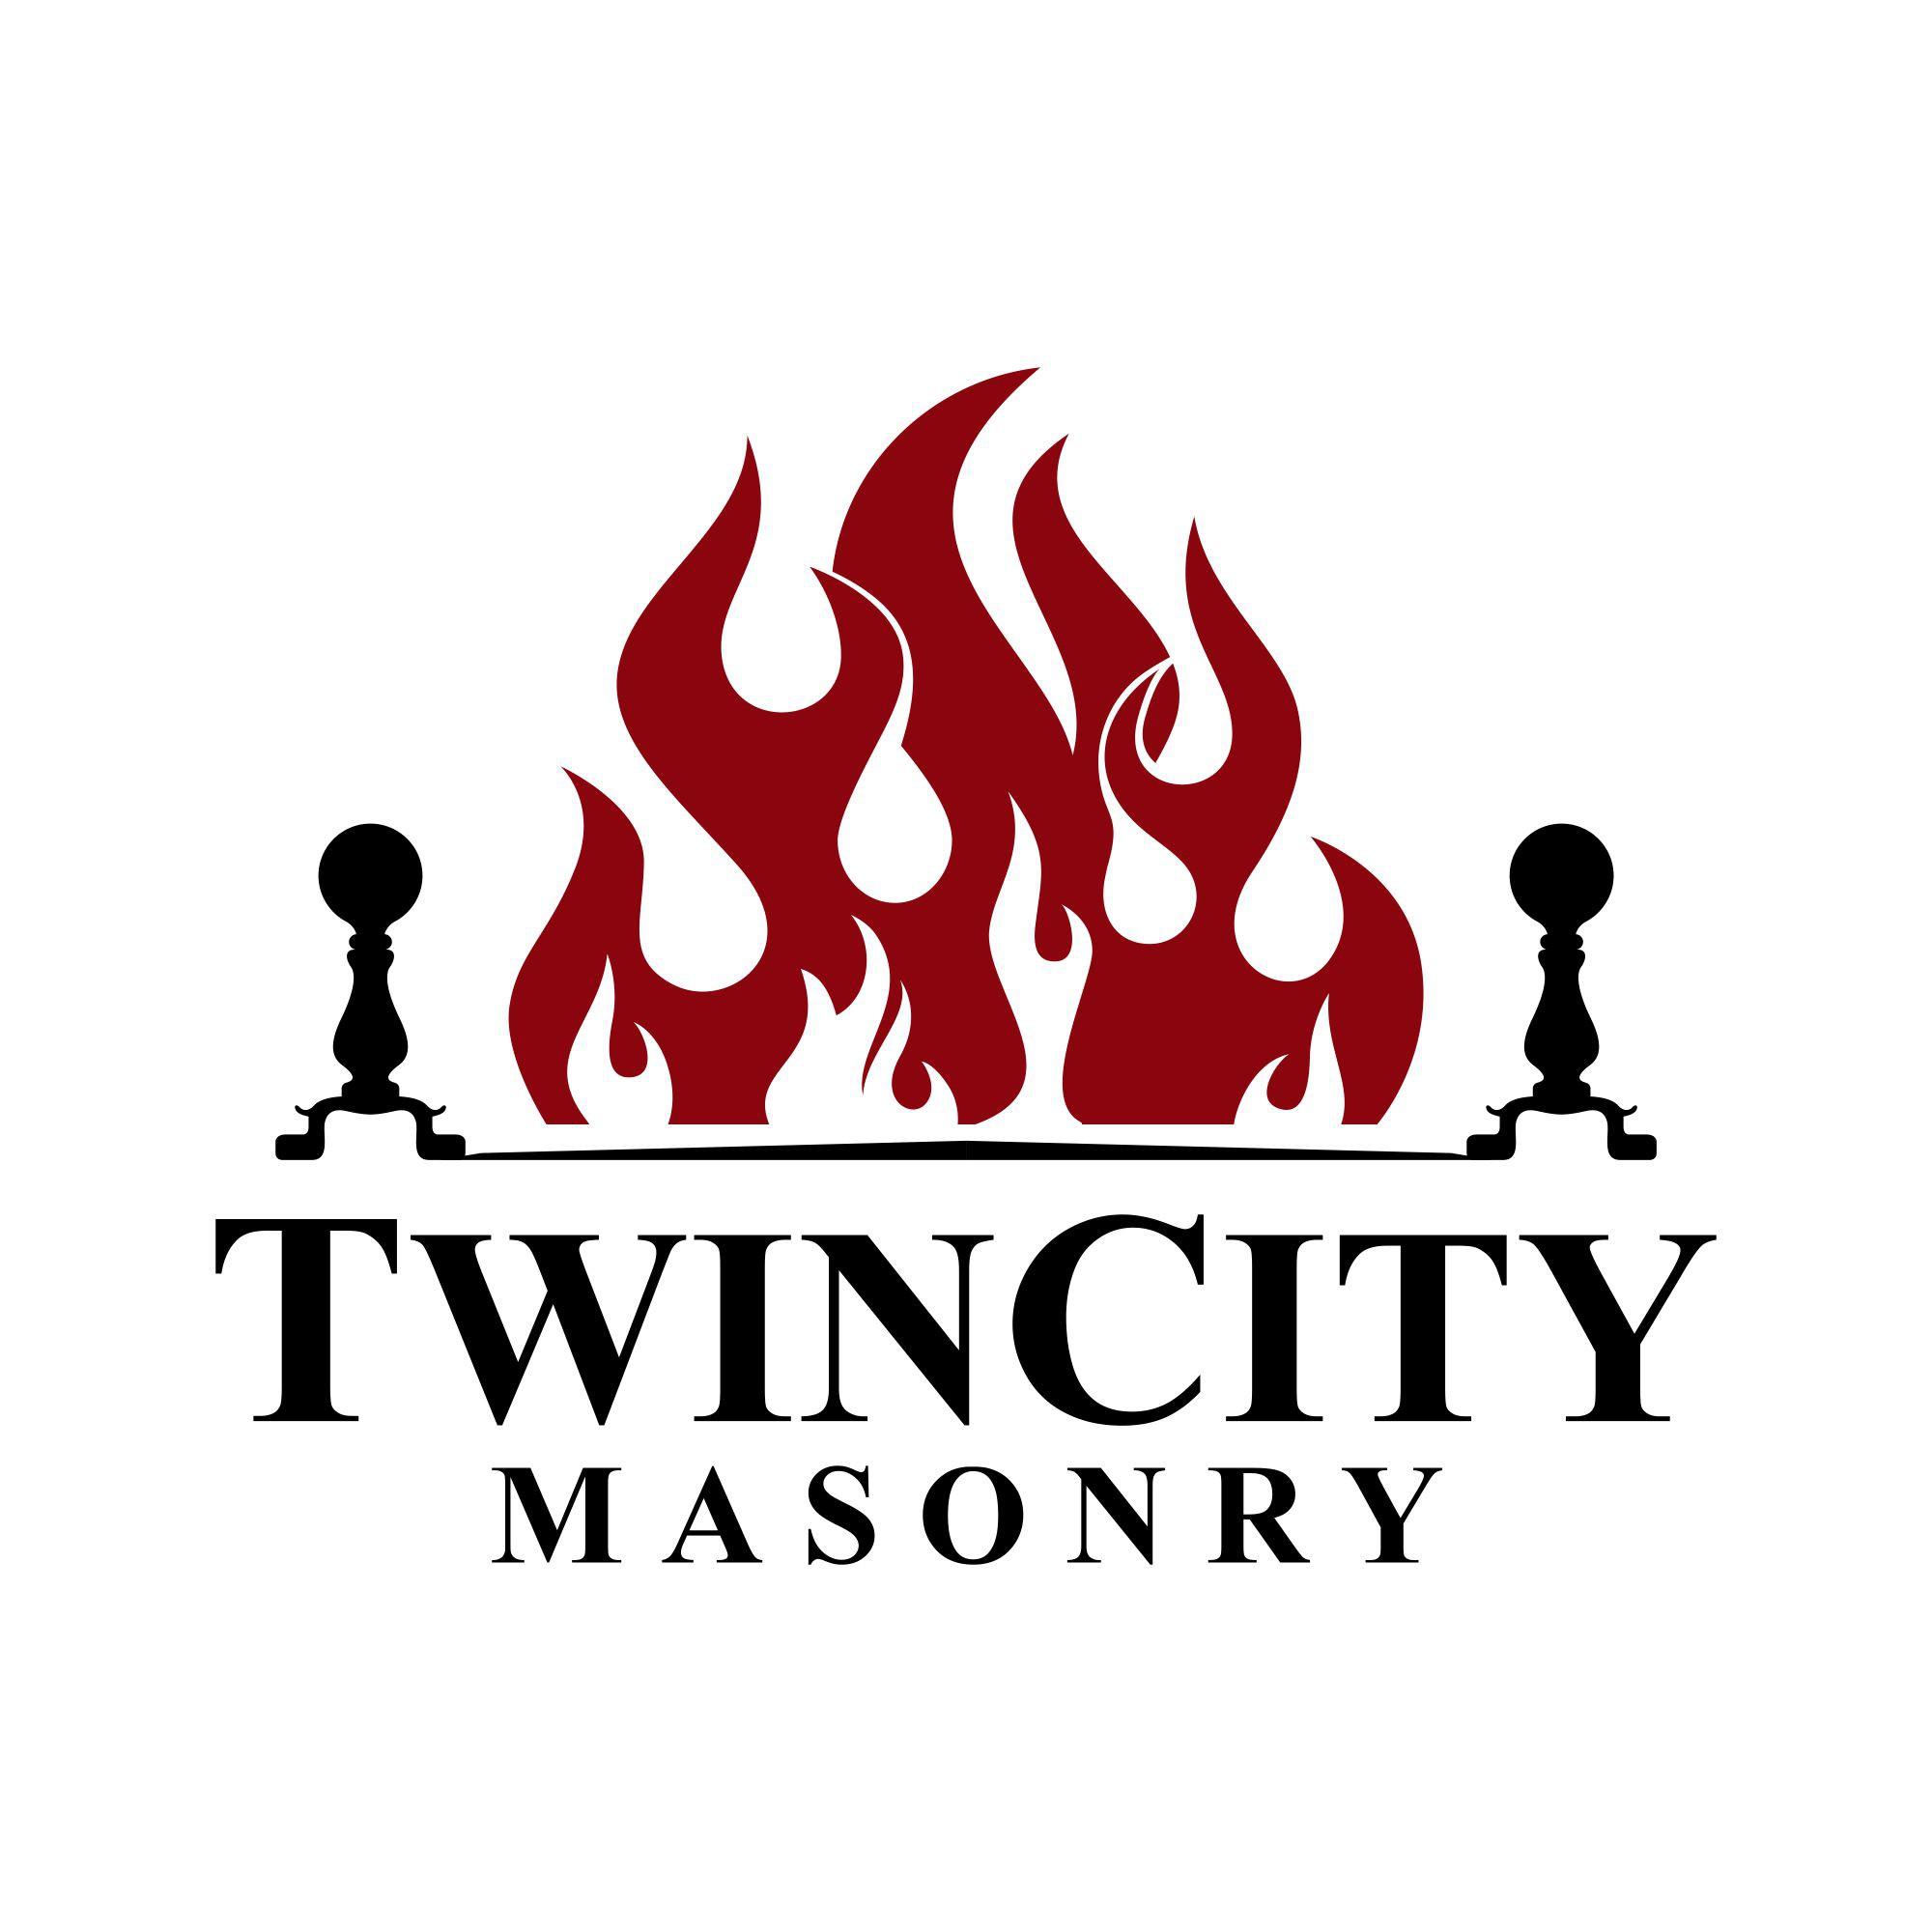 re-designing current businesses logo TWINCITY